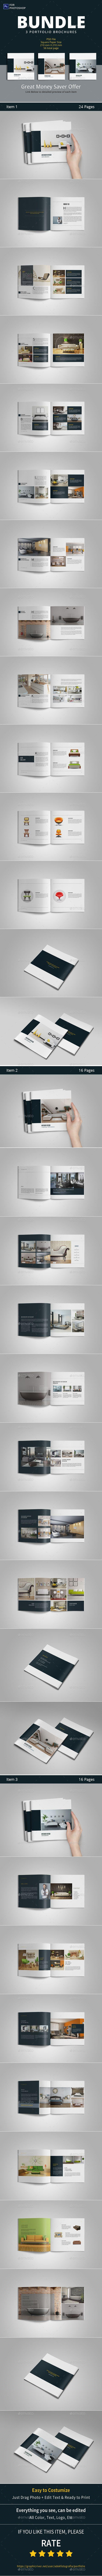 Portfolio Brochure BUNDLE - Templates PSD